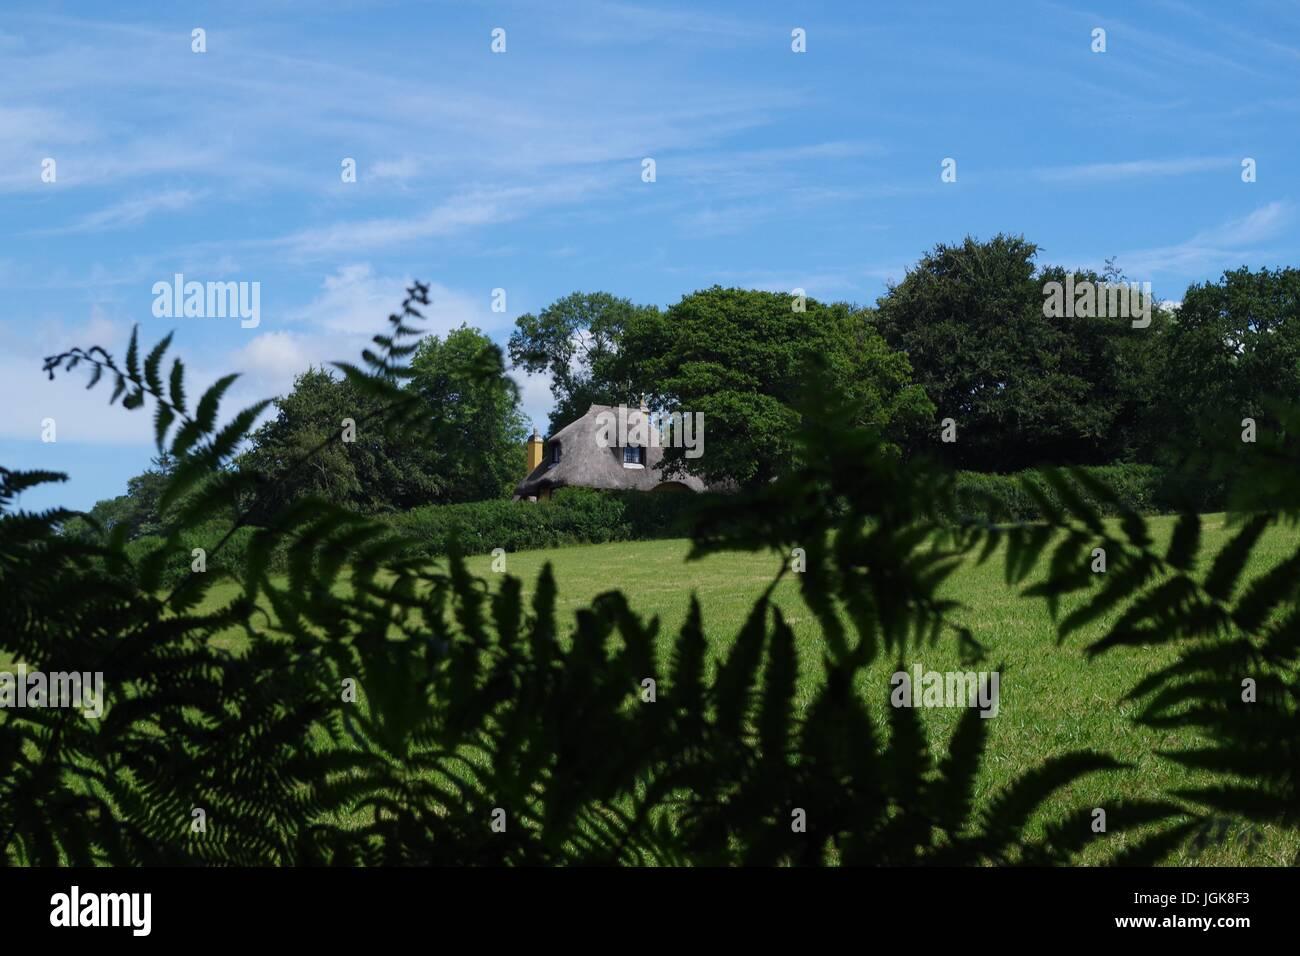 Tumbly Cottage, Holne. Dartmoor National Park, Devon, UK. July, 2017. - Stock Image